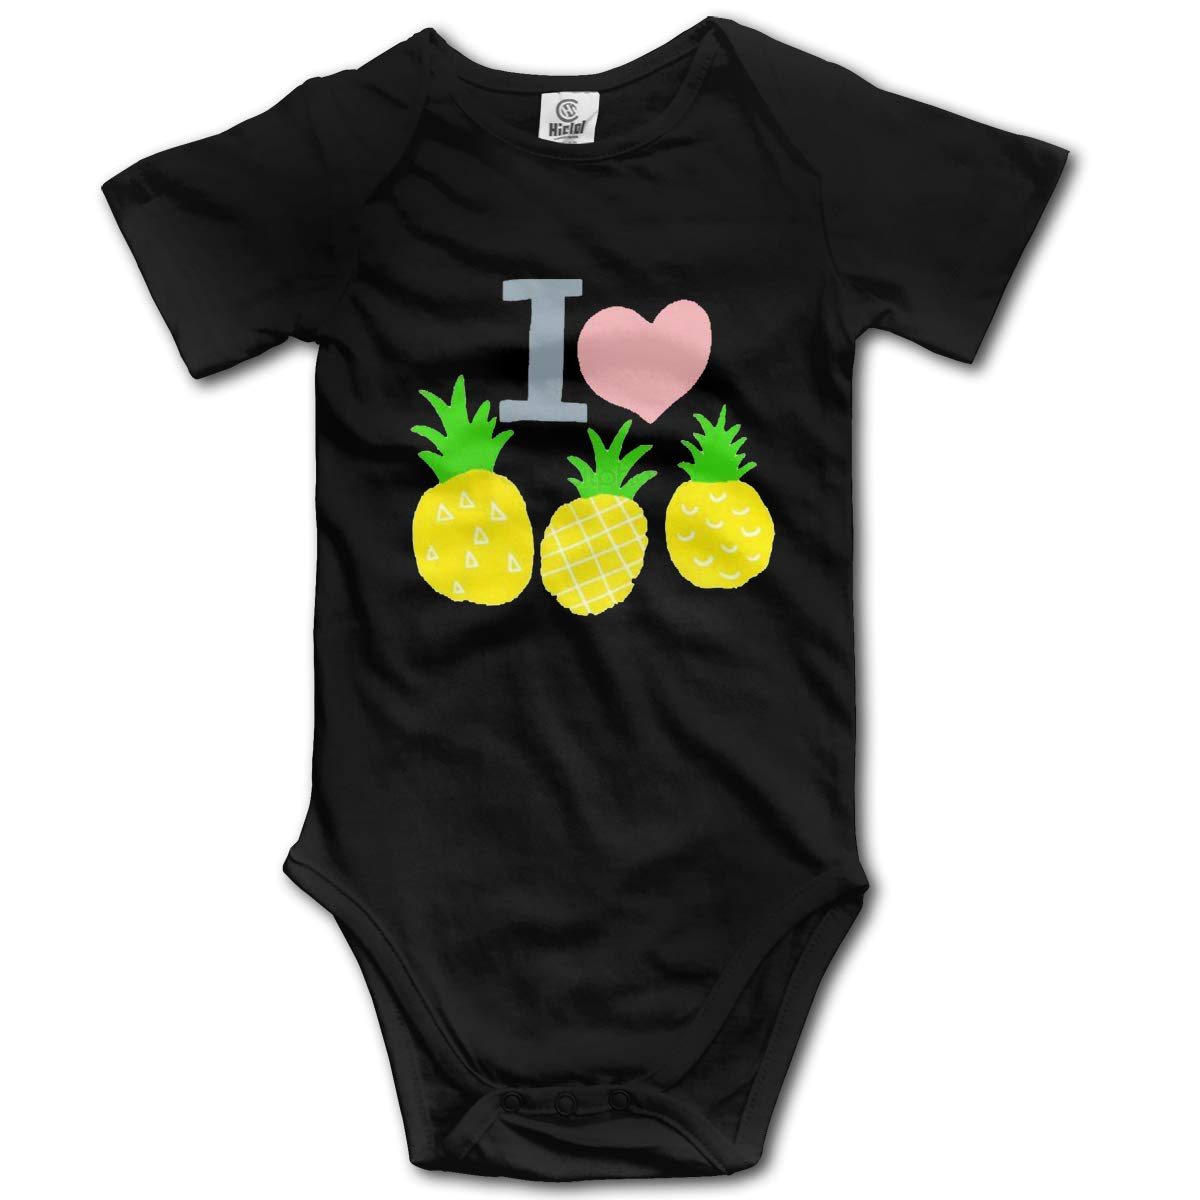 VANMASS Little Babys I Love Pineapple Short Sleeve Bodysuits Playsuit Clothes